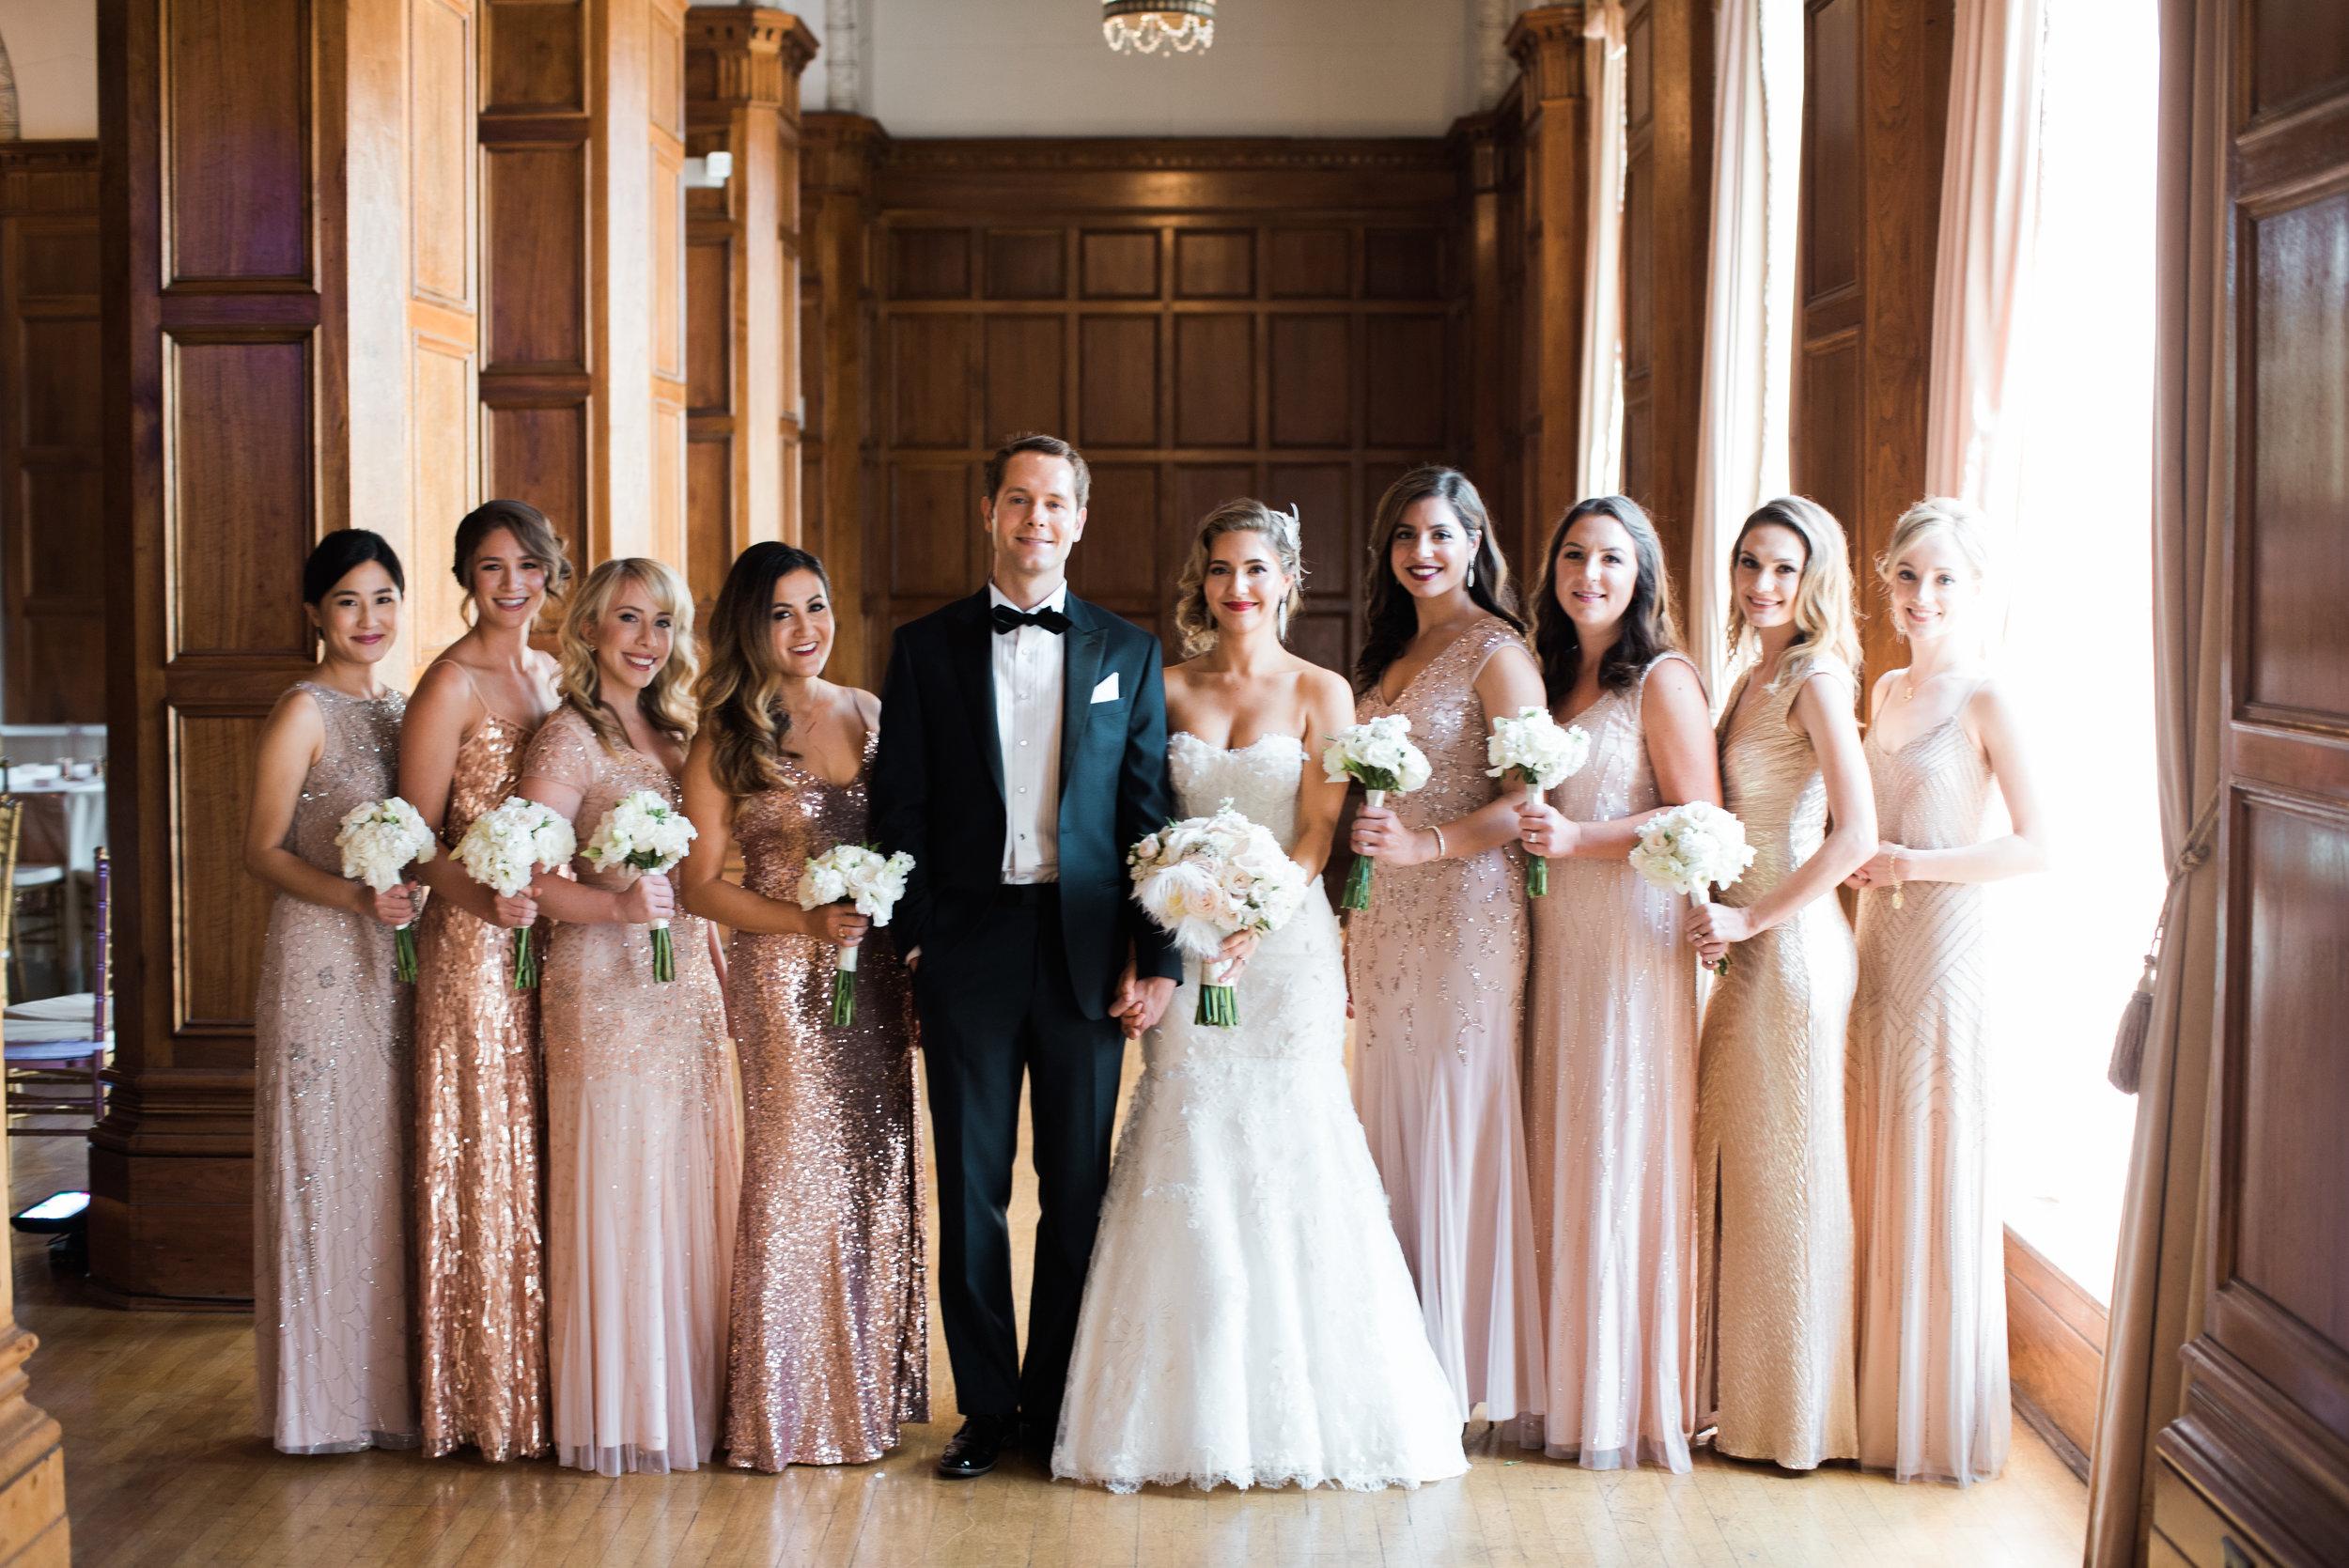 wedding_photographer_greg_ross-001.jpg